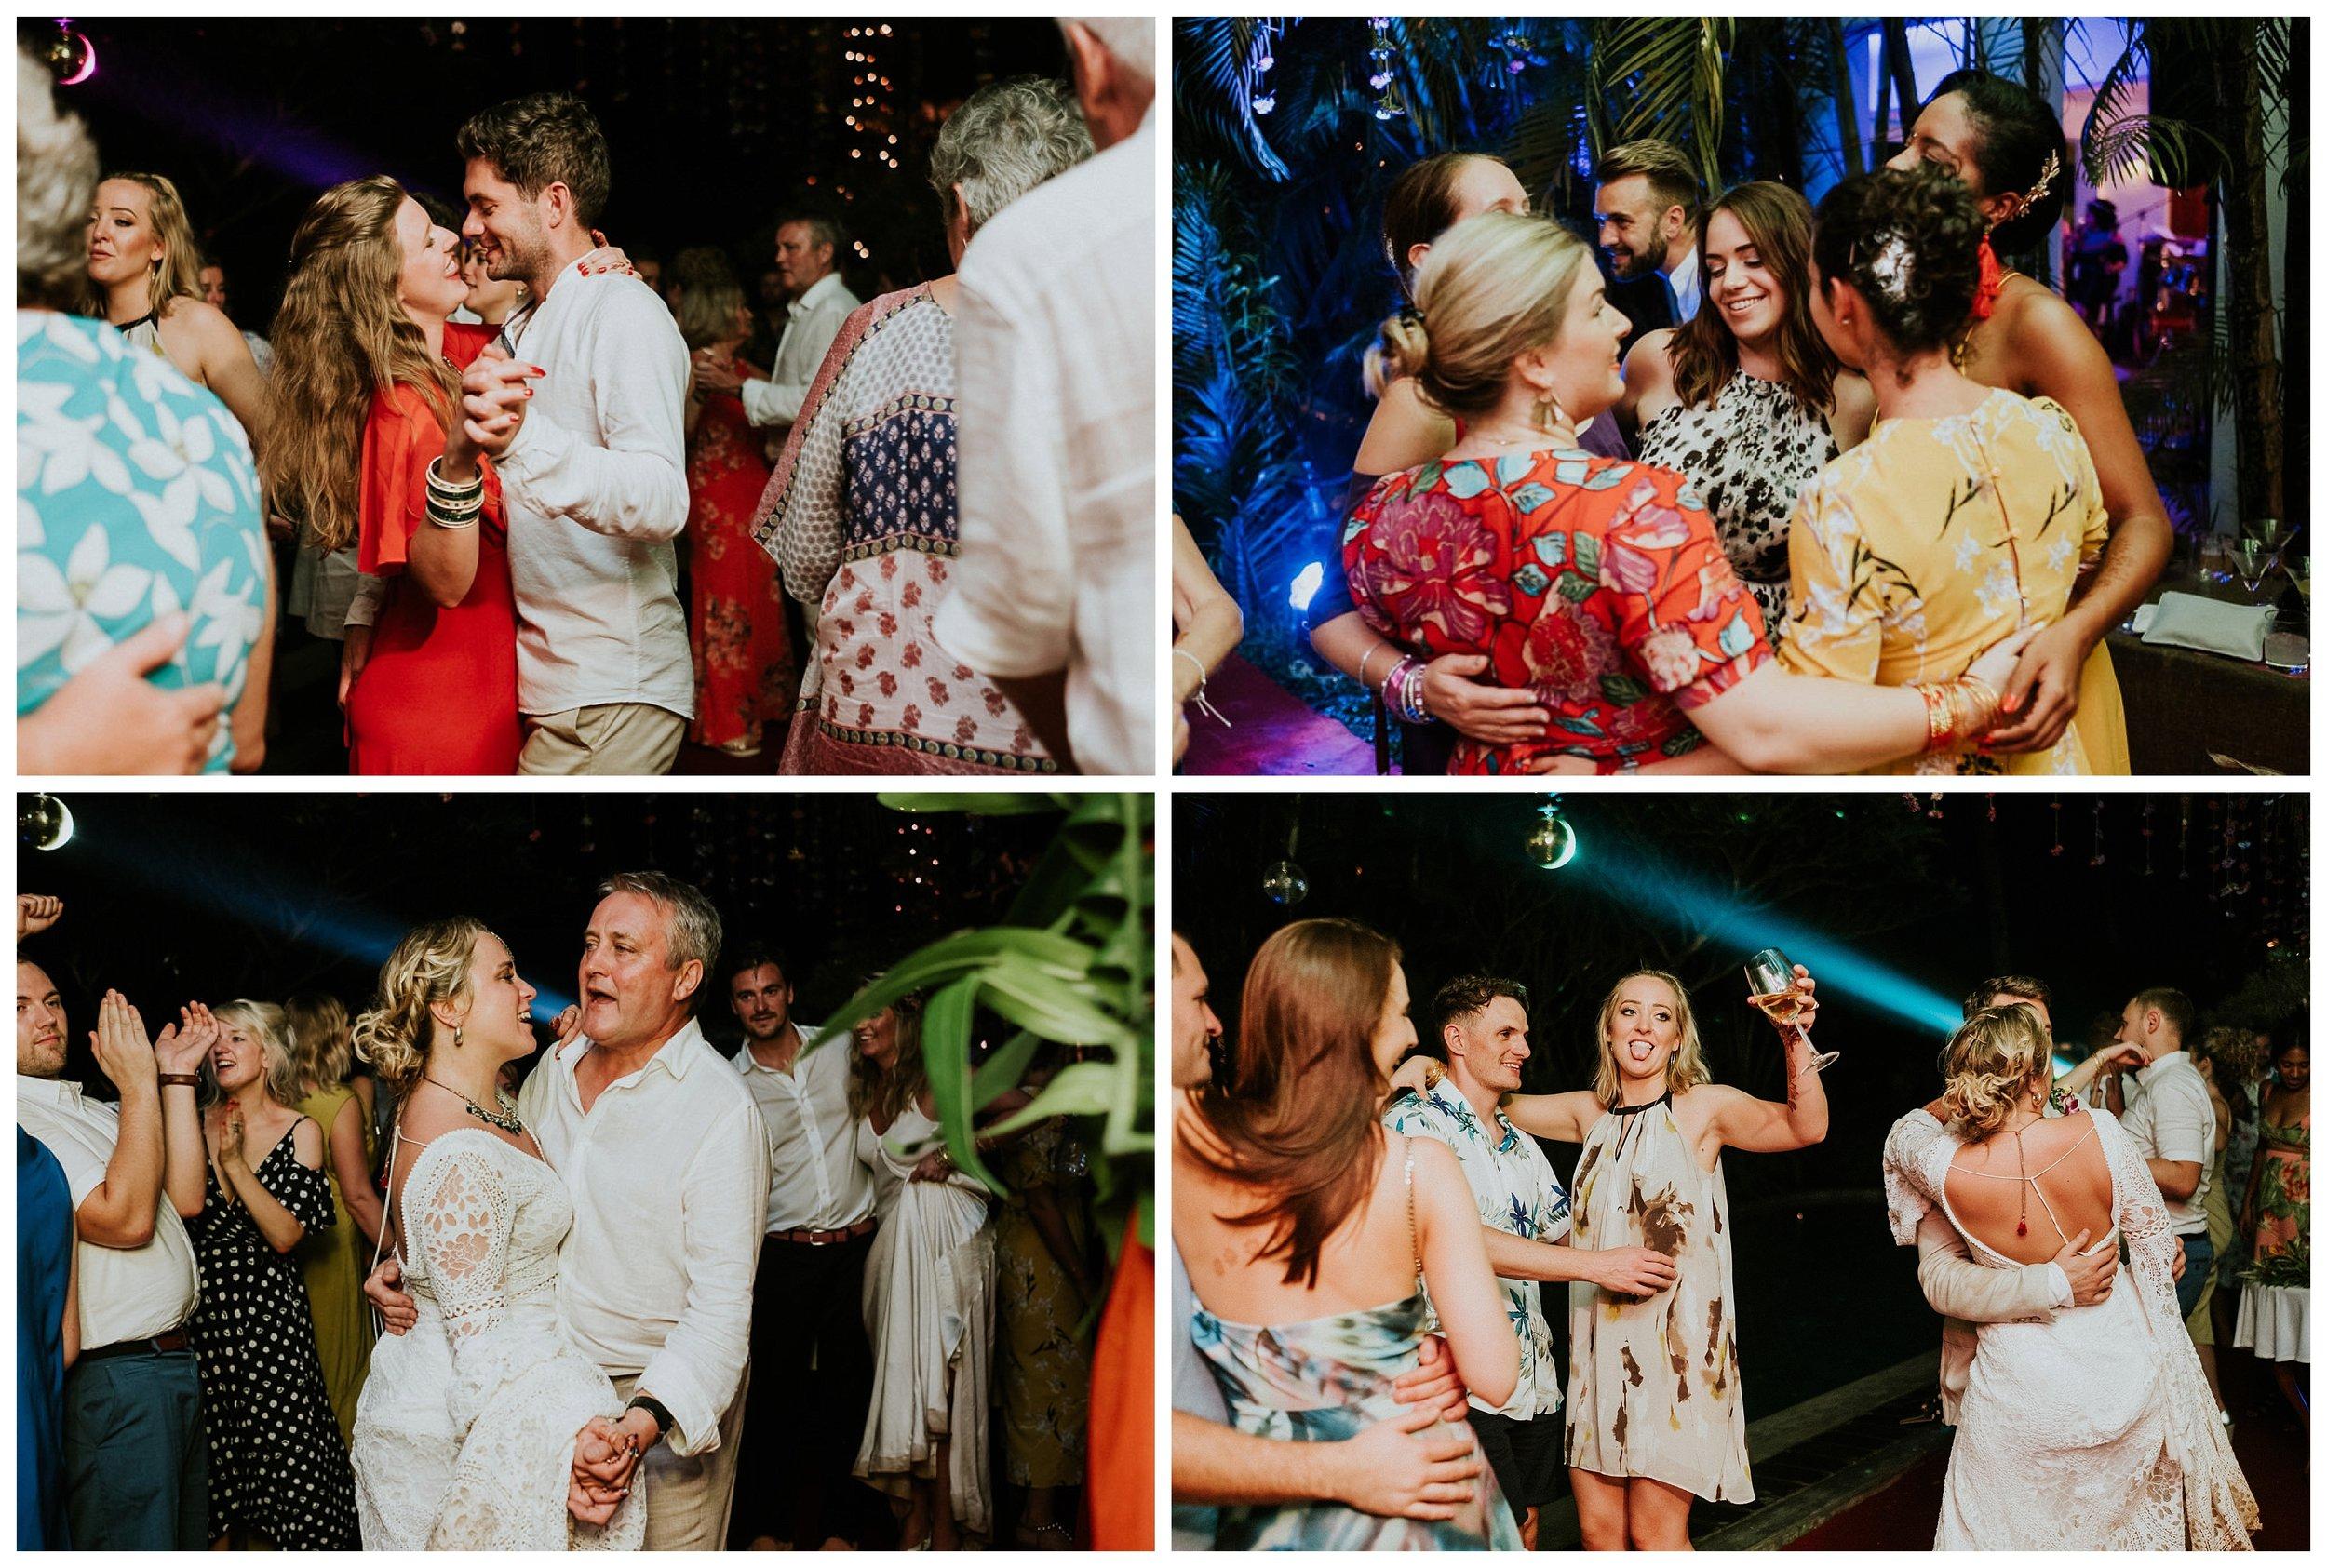 Goa Destination Wedding Photographer India Colouful Fun Joanna Nicole Photography Coco Shambhala27.jpg